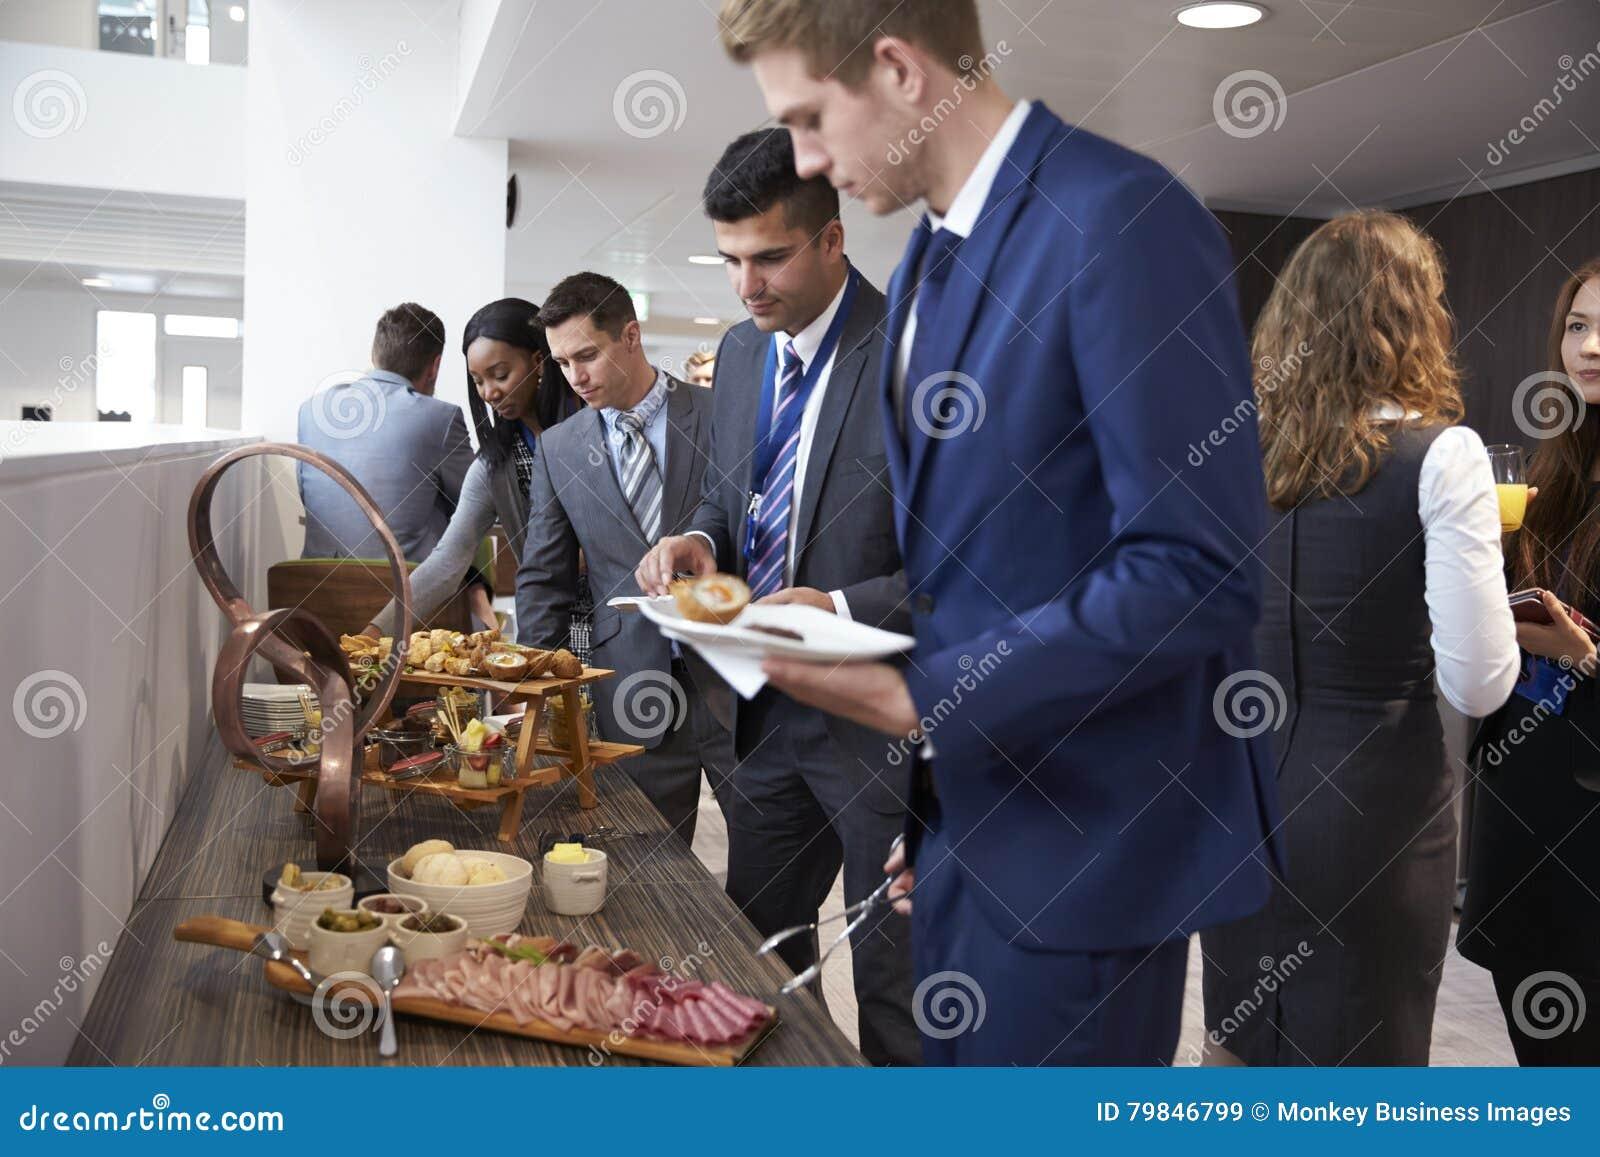 Delegados no bufete do almoço durante a ruptura da conferência